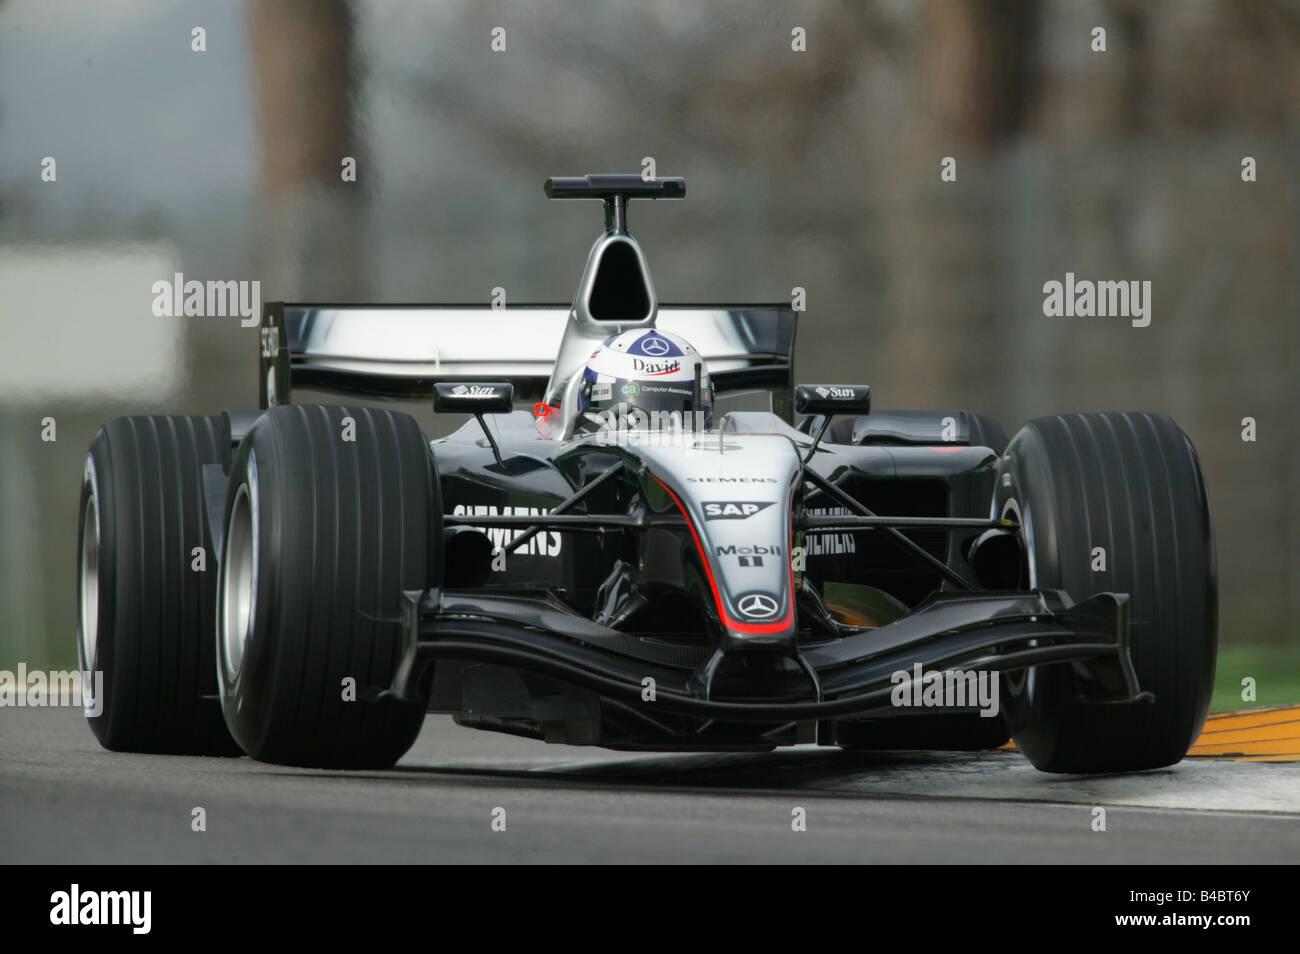 engine sport, david coulthard in mclaren mercedes, training, formel